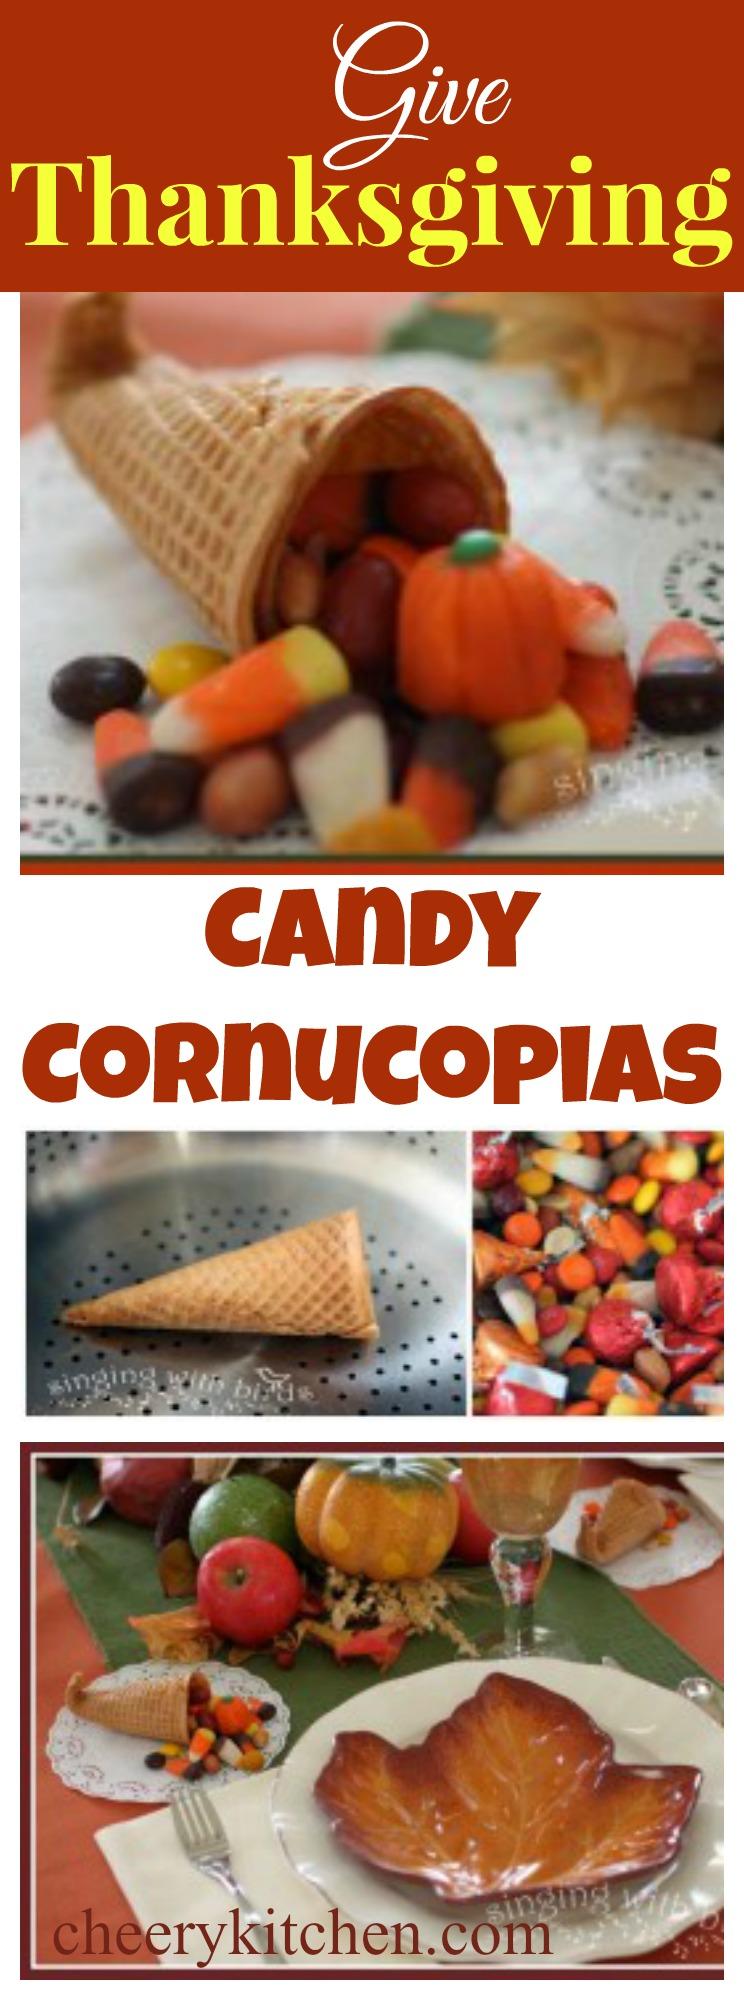 Thanksgiving Candy Cornucopias